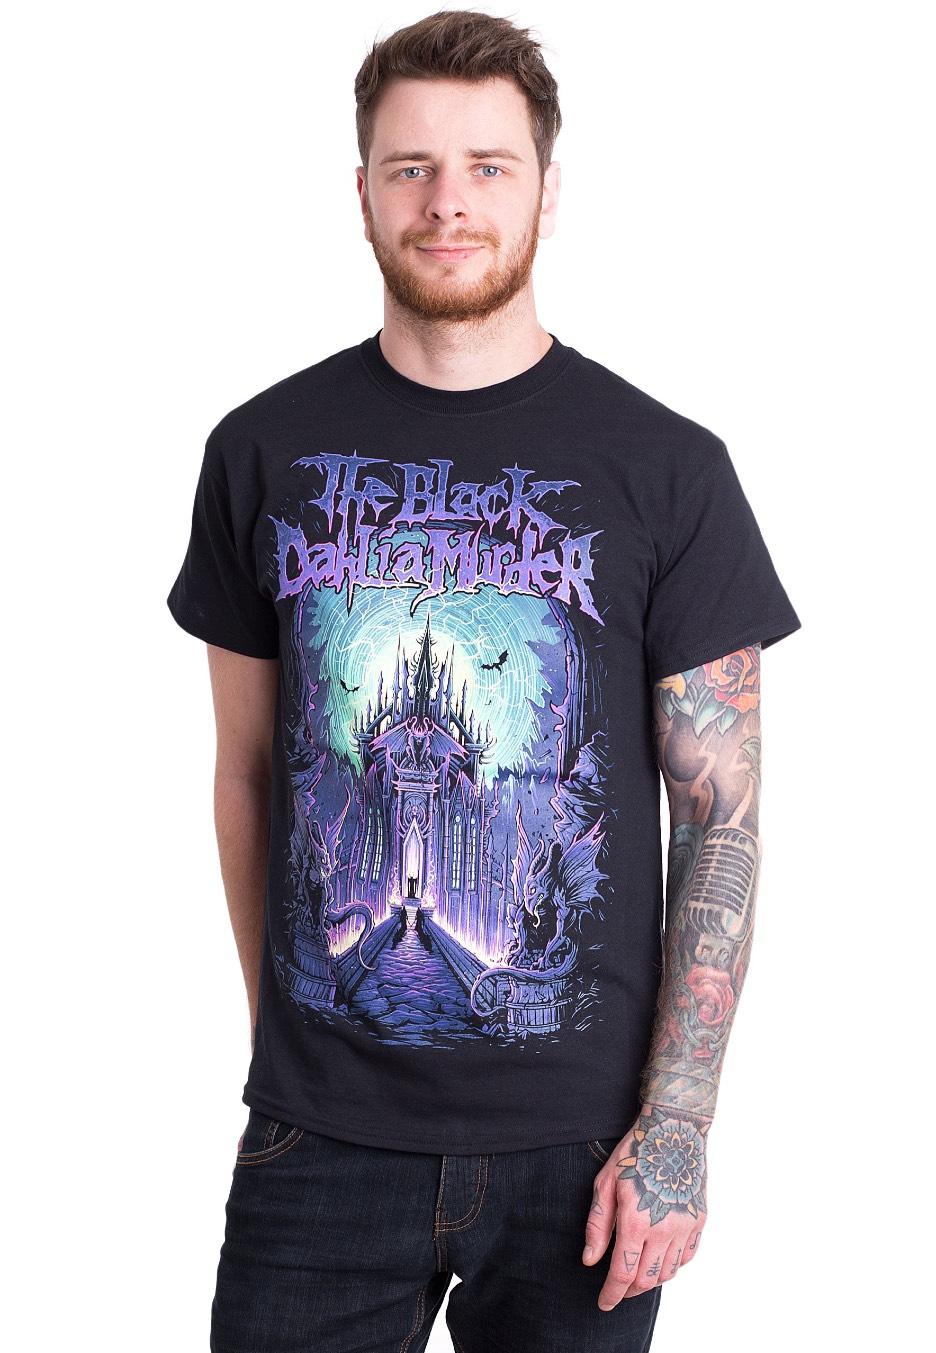 b15f72915 The Black Dahlia Murder - Nocturnal 10 Years - T-Shirt - Impericon.com  Worldwide